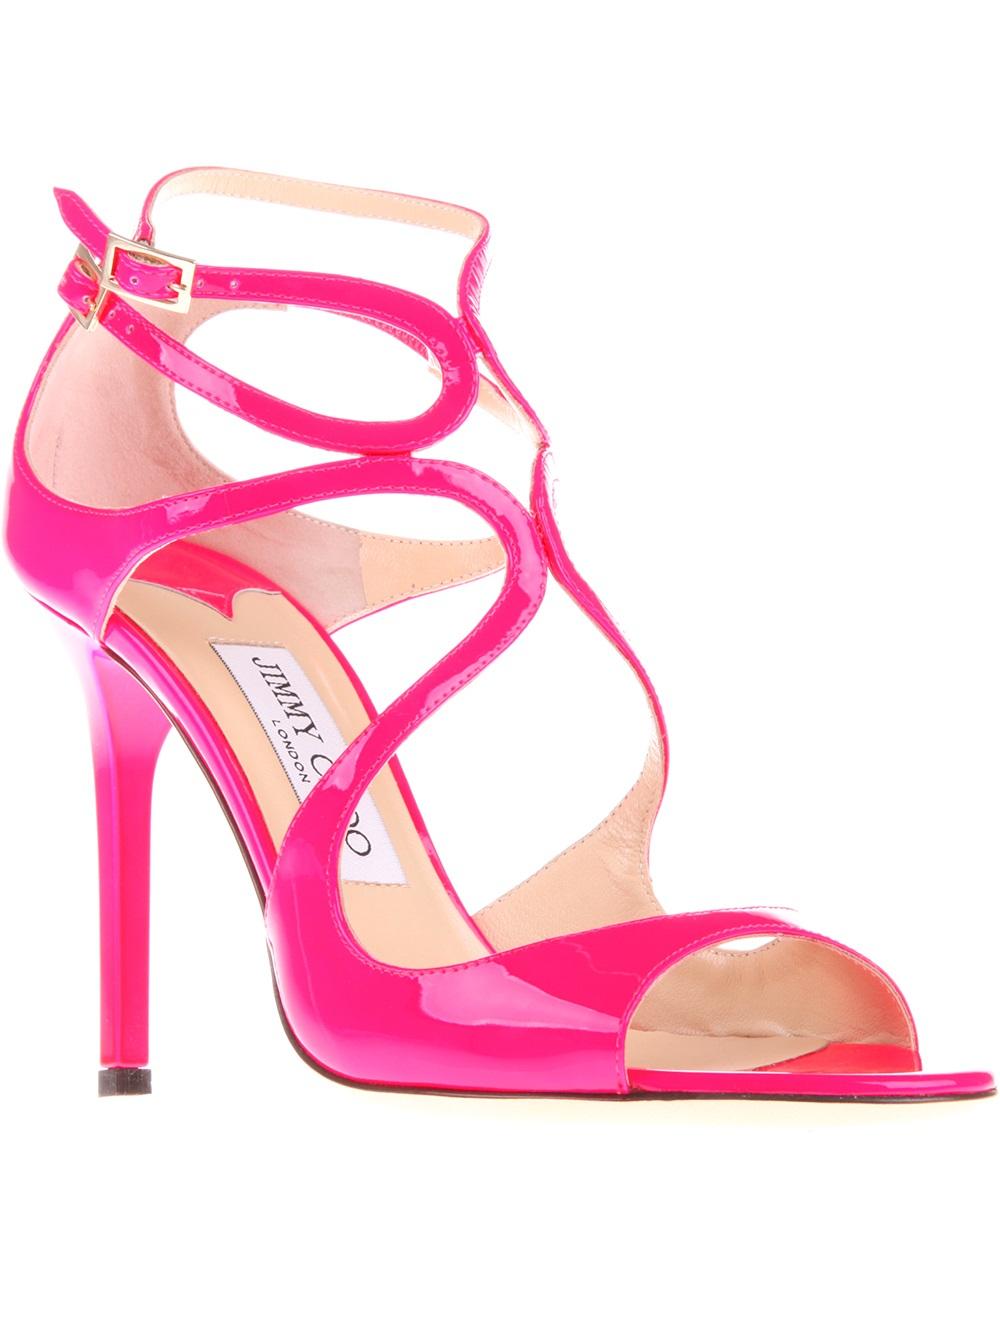 pink jimmy choos